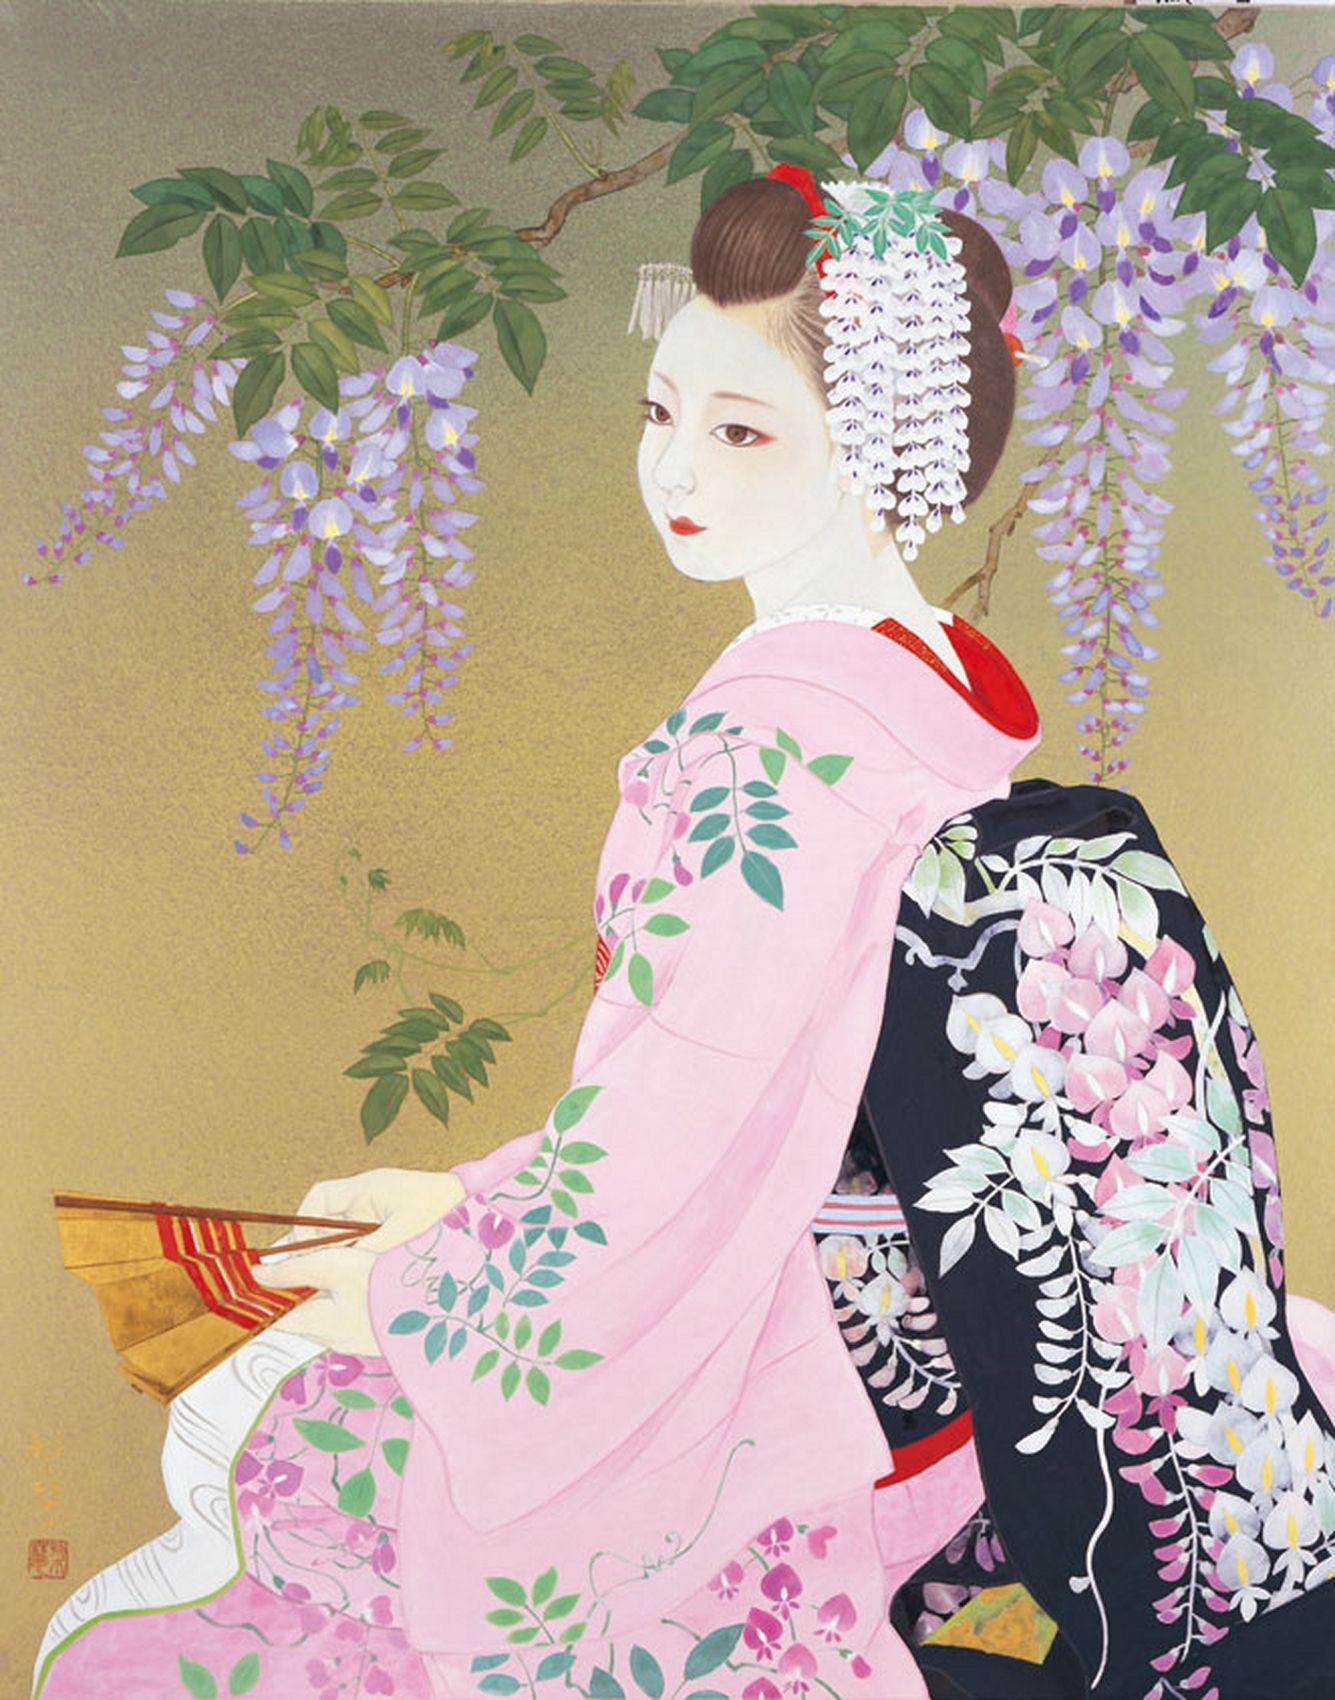 Fuji Musume Wisteria by Morita Rieko.